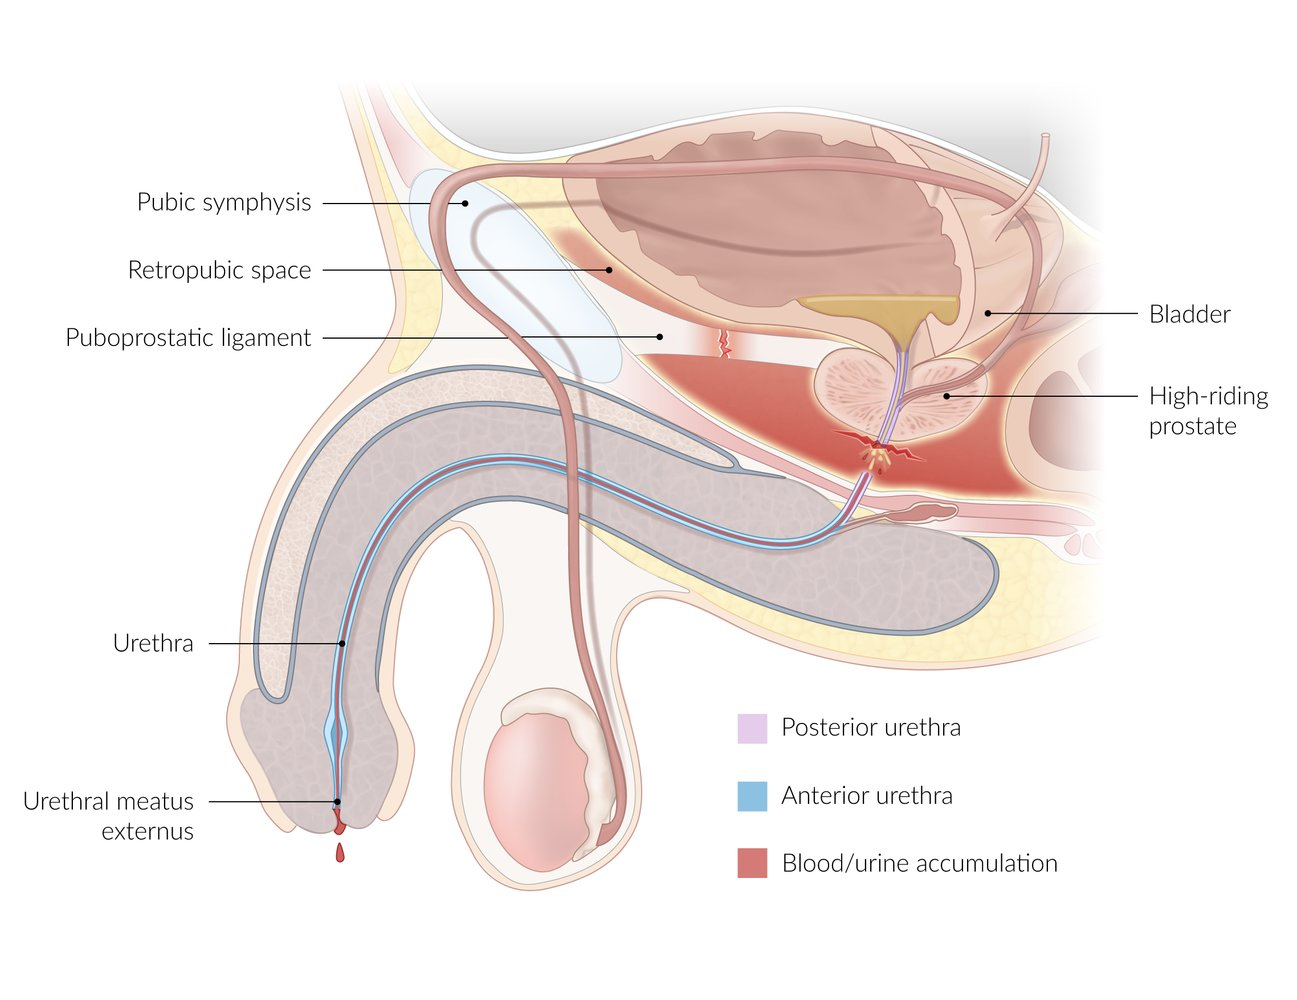 Structure of Urethra